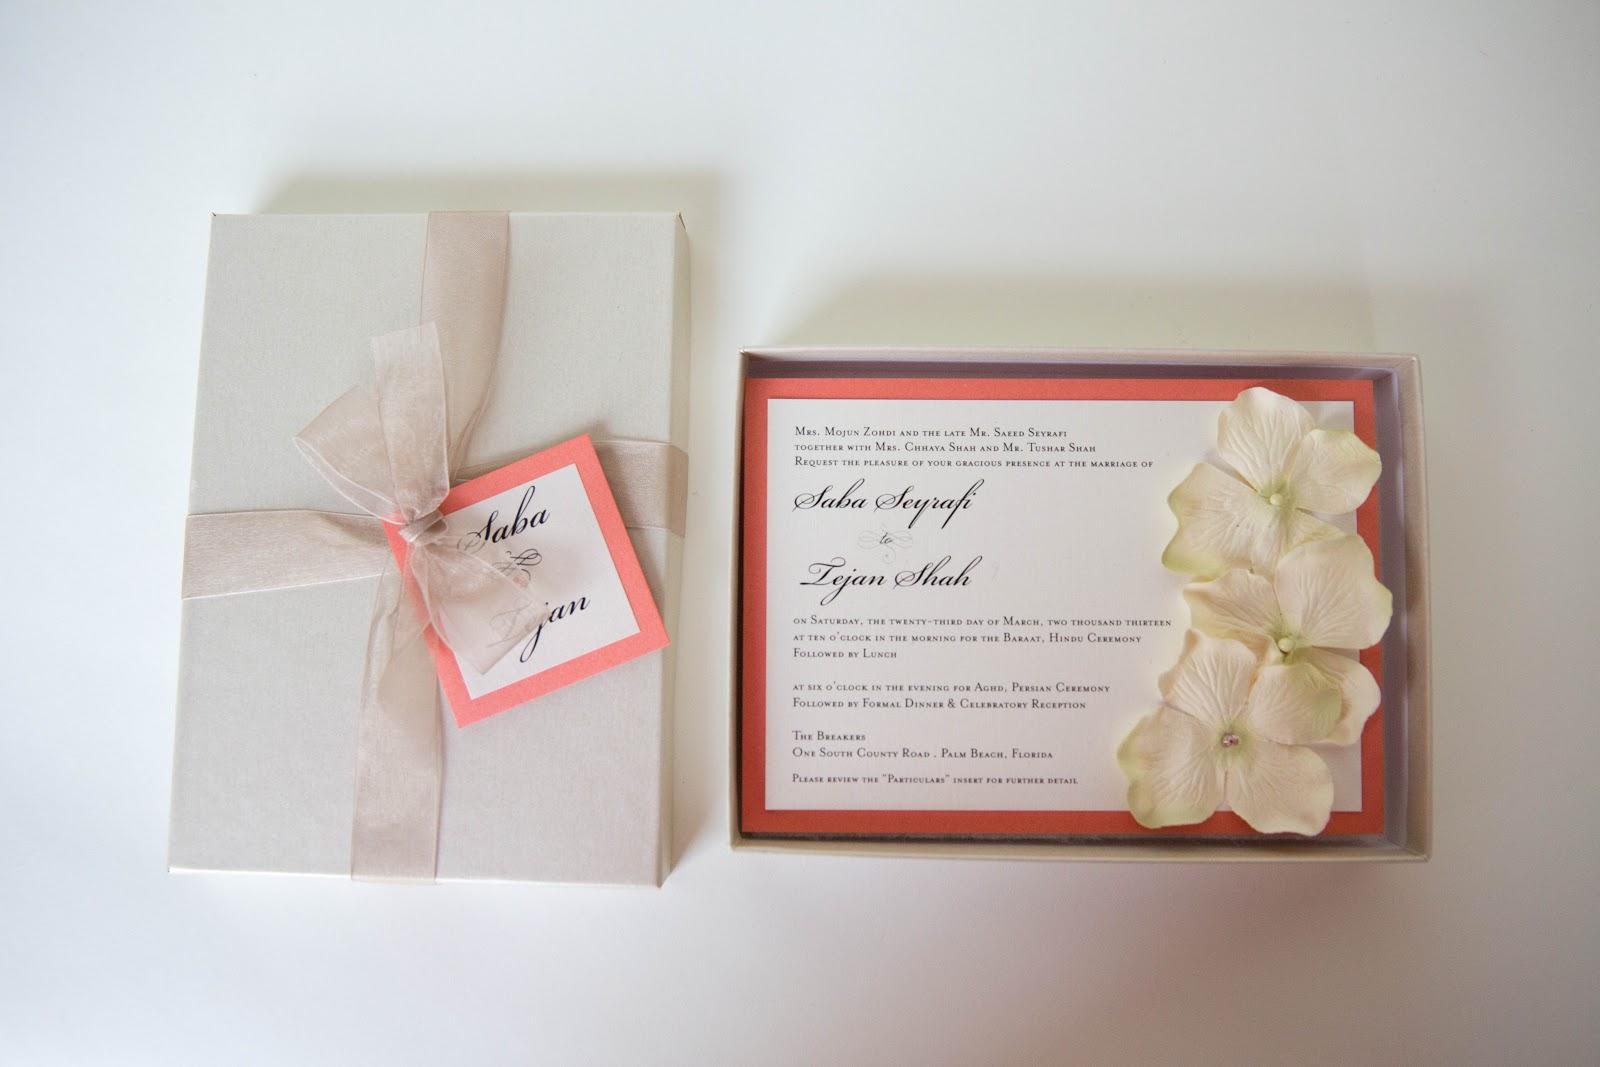 Box Of Wedding Invitations: Kindly R.S.V.P. Designs' Blog: Box Invitation • Boxed